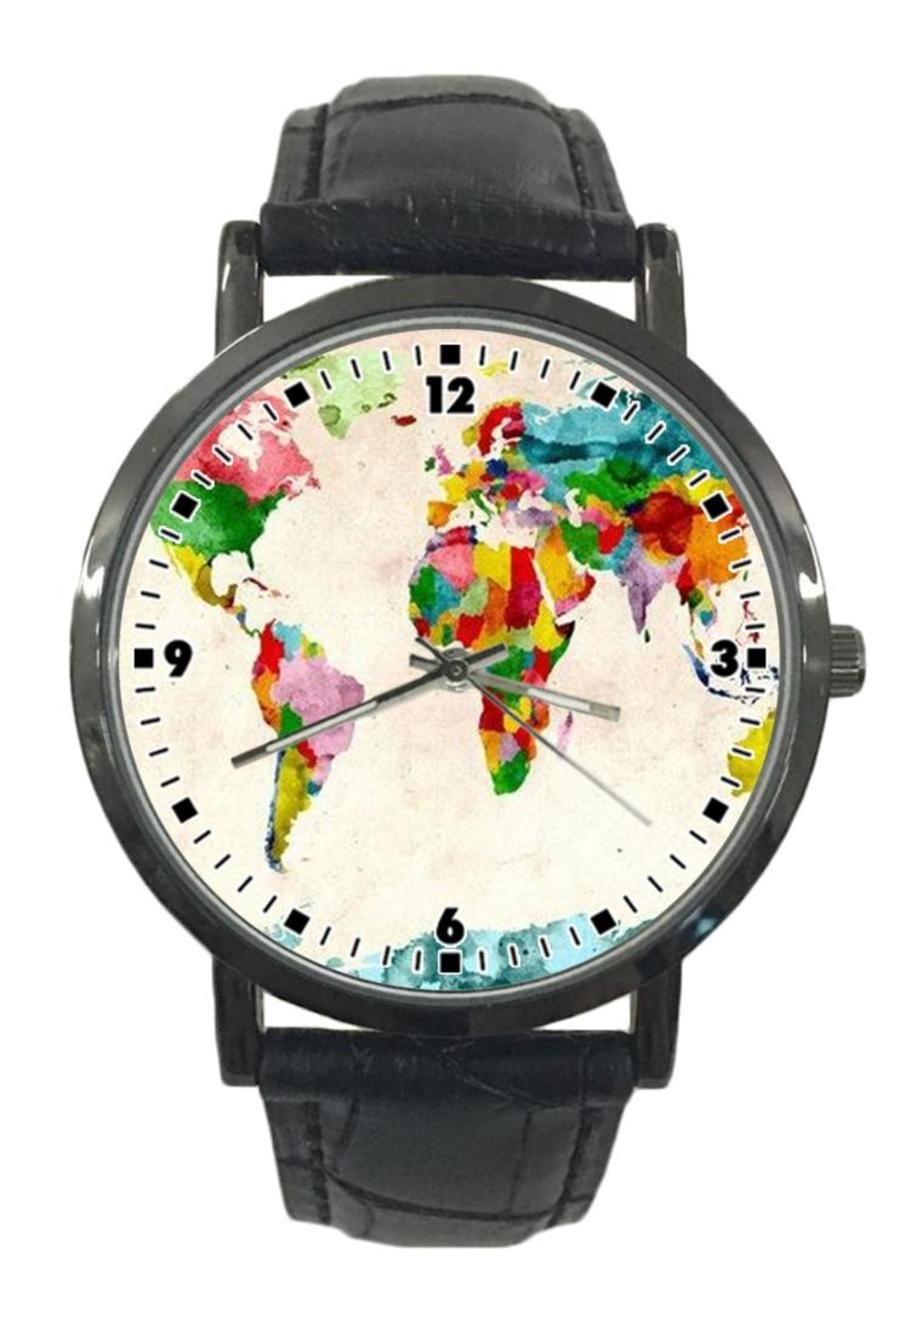 jkfgweeryhrt New Simple Fashion World Map Stainless Steel Leather Analog Quartz Sport Wrist Watch